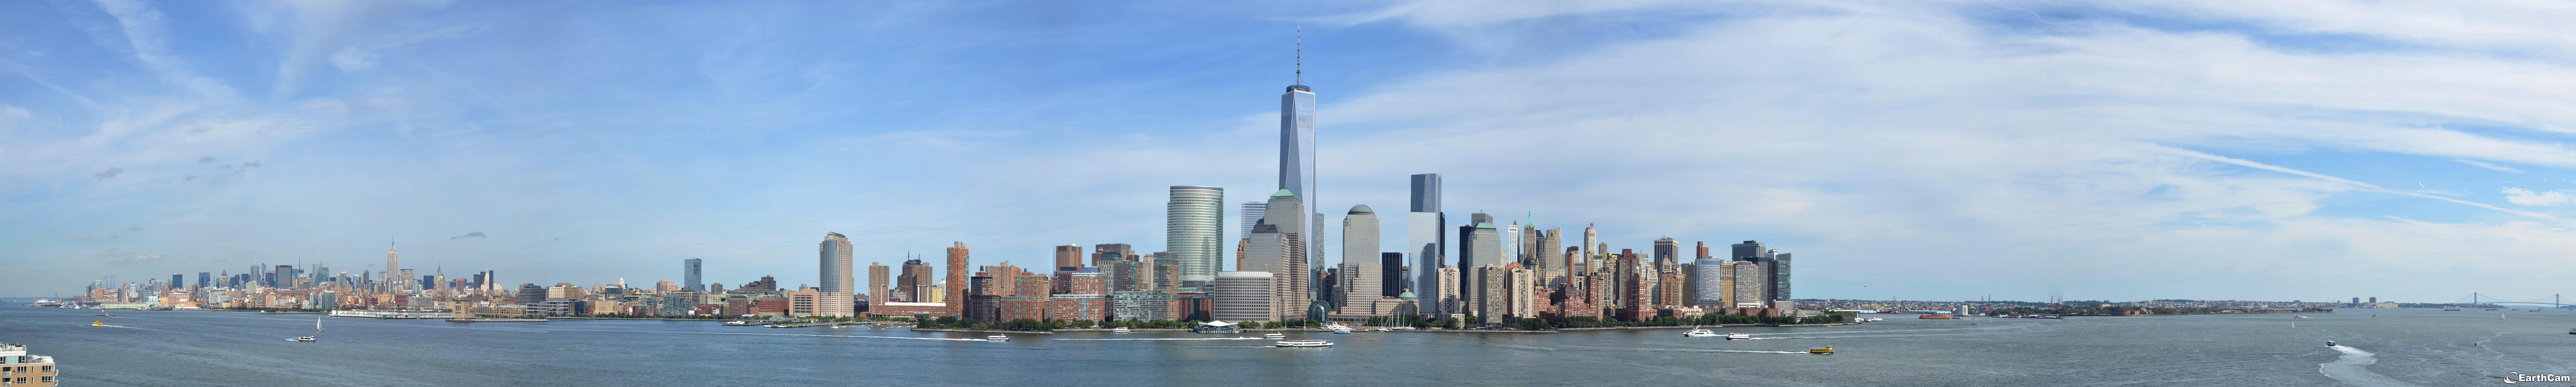 earthcam new york world trade center